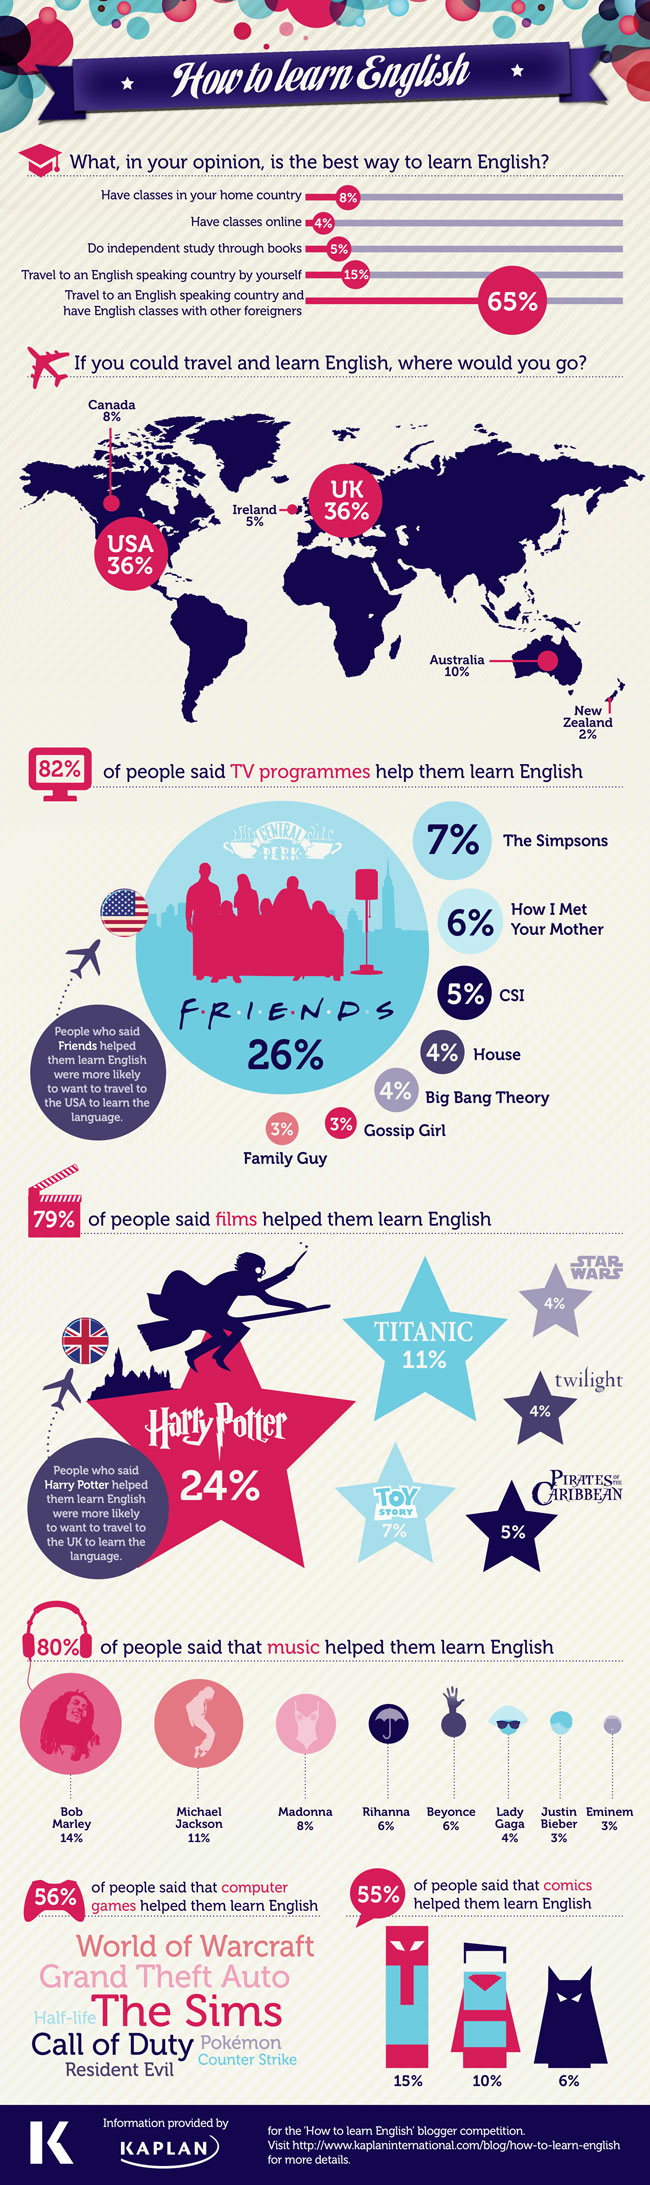 How to Learn English Infographic | Kaplan International English Blog